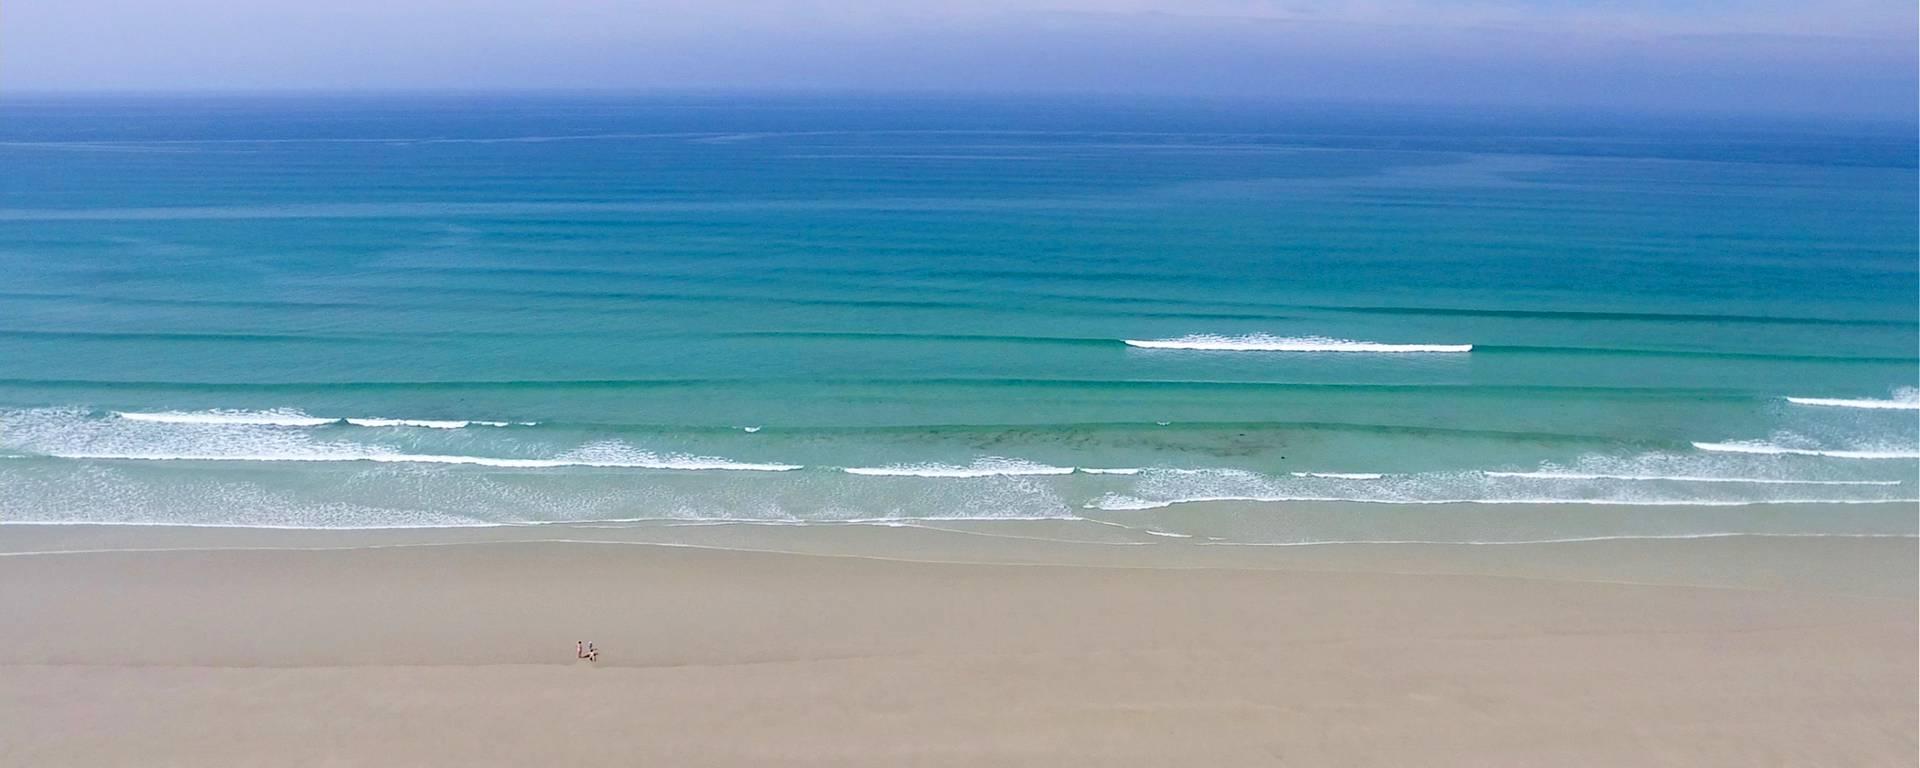 Plovan beach, Pays Bigouden © Air Pixel Concept